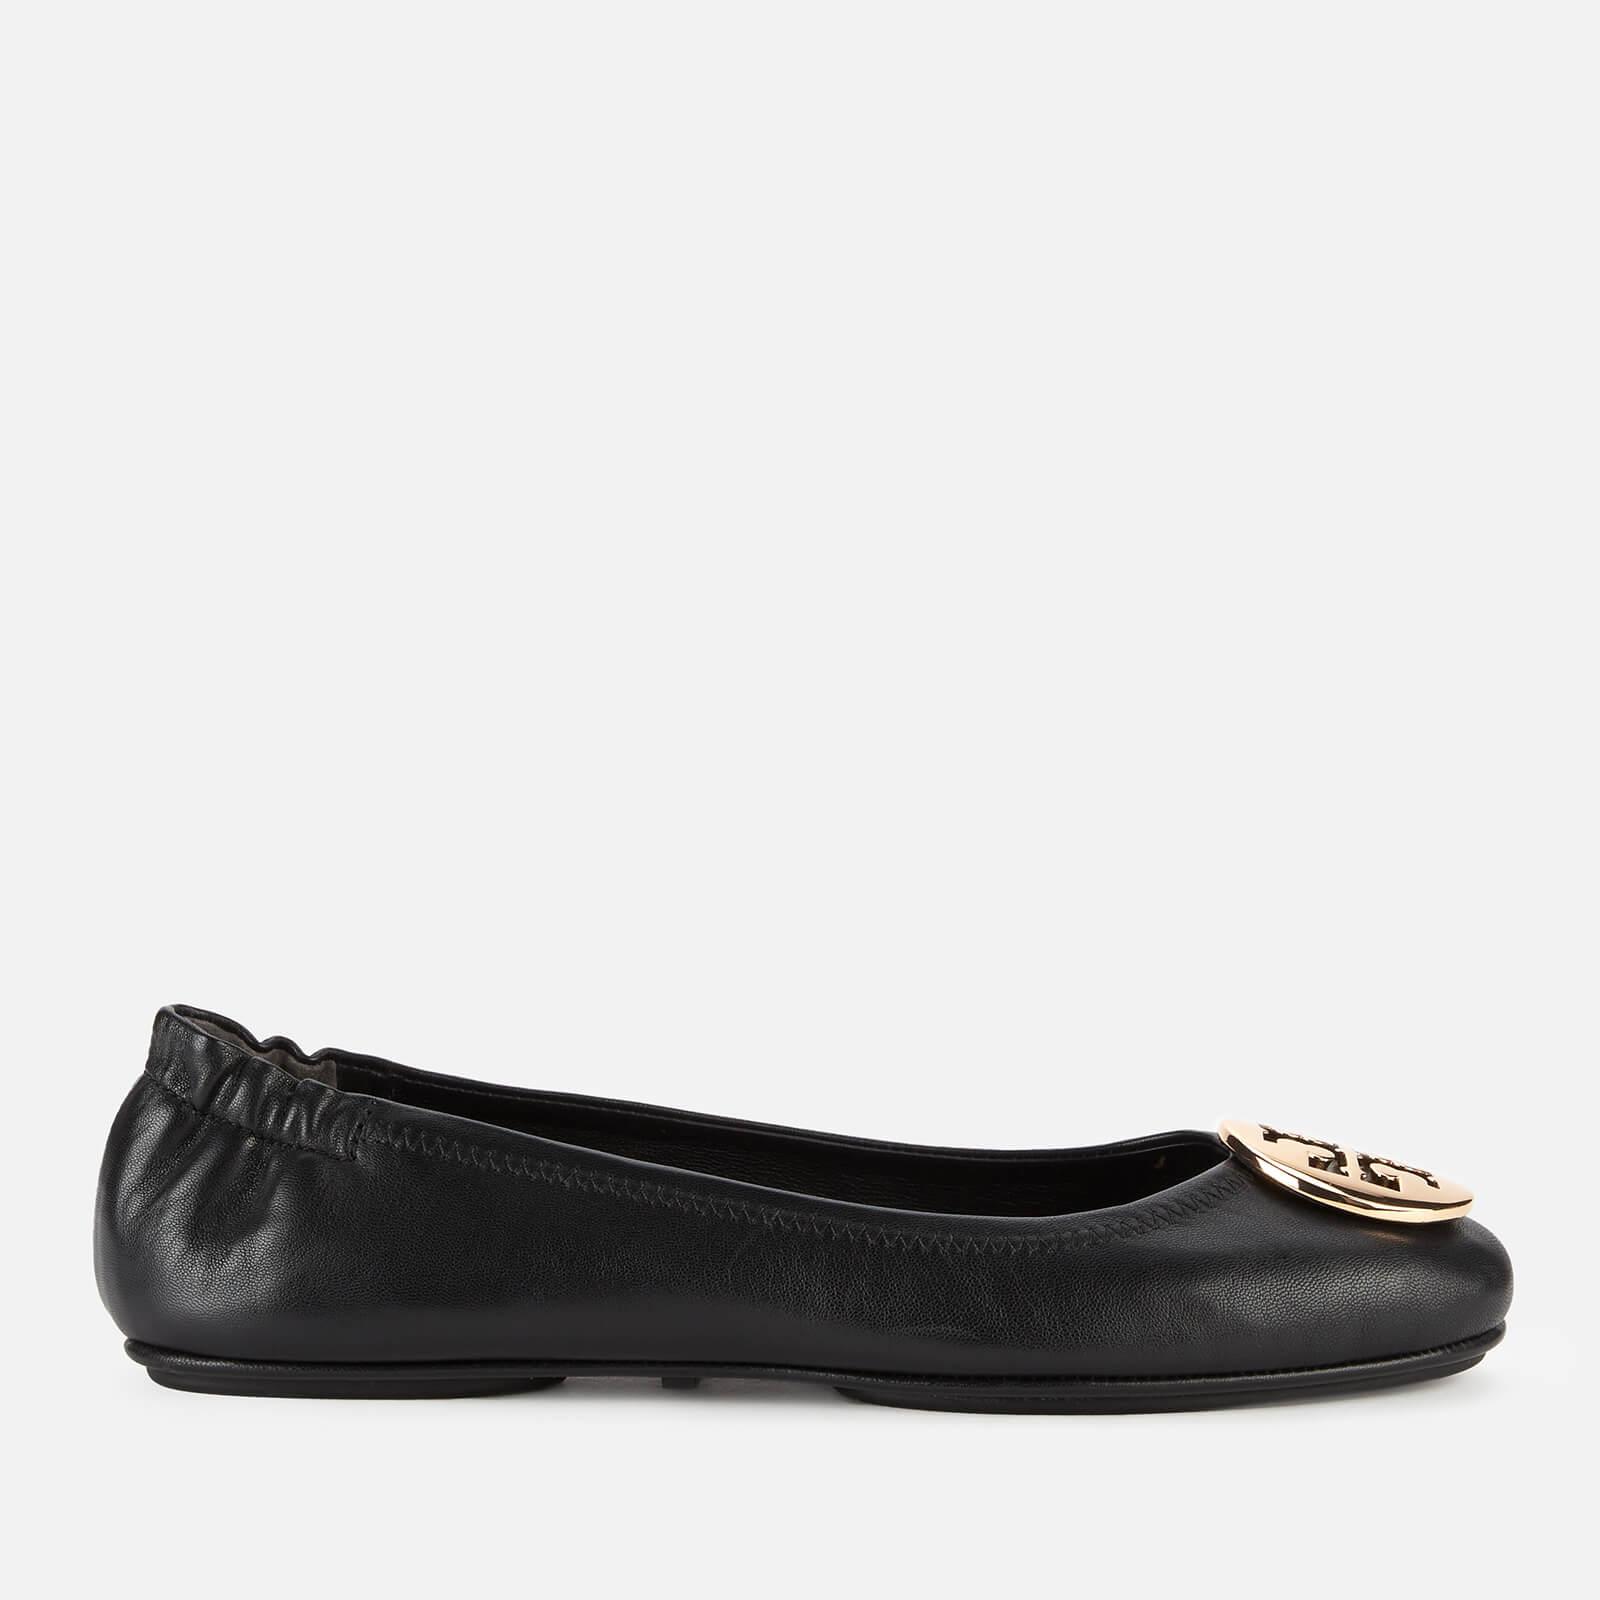 Tory Burch Women's Minnie Metal Logo Leather Ballet Flats - Perfect Black/Gold - 3